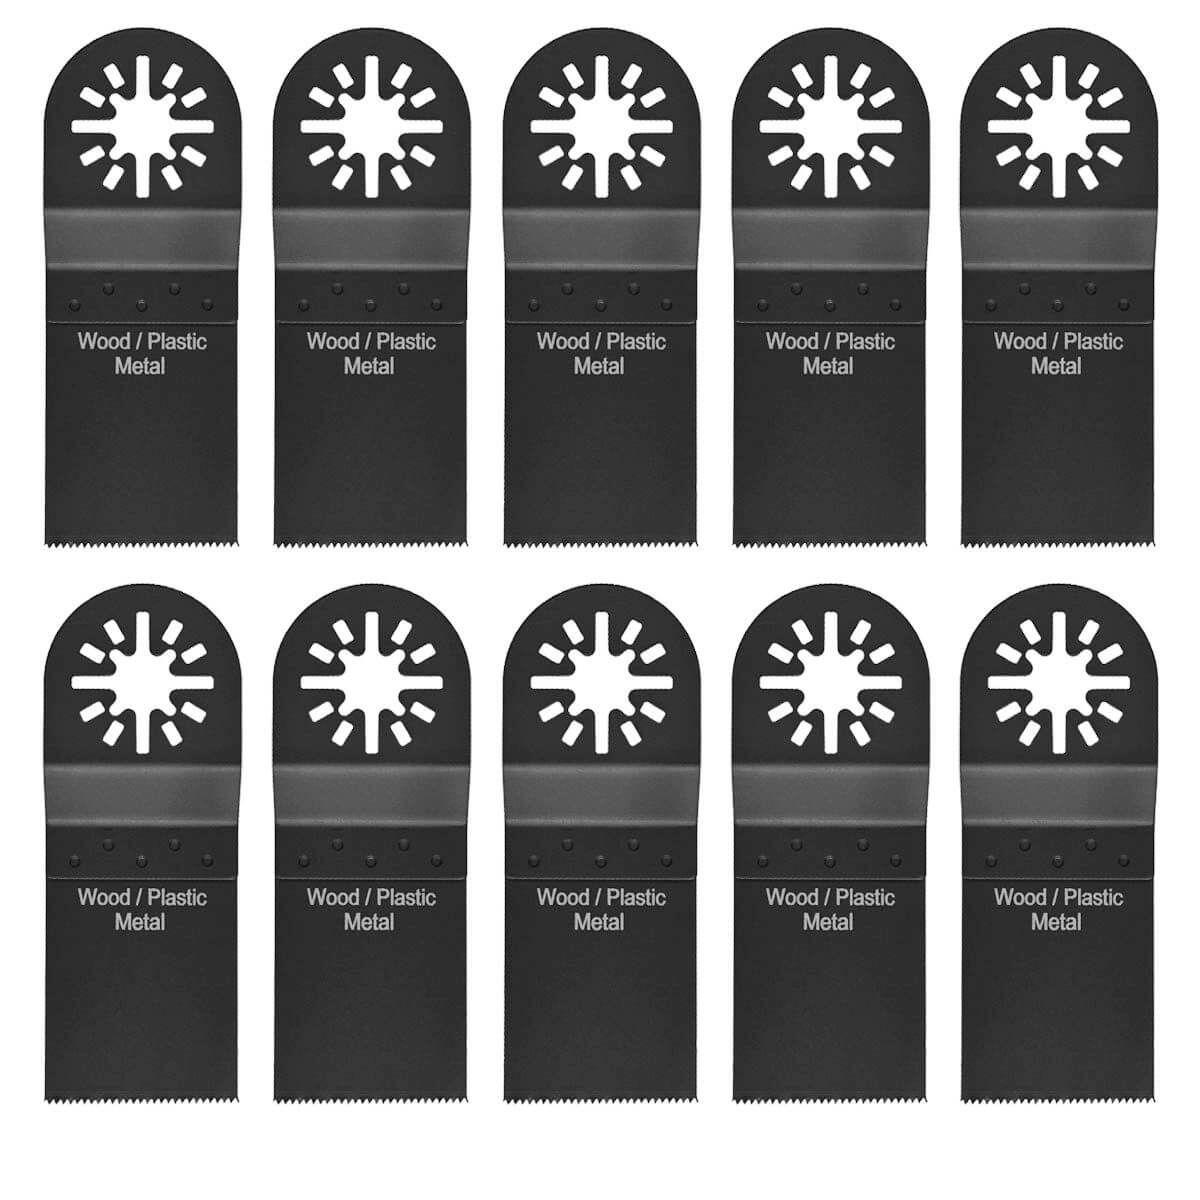 10pcs Bi Metal Oscillating Multi Tool Saw Blades for Bosch Ryobi Makita  Skil Ridgid Milwaukee Einhell AEG